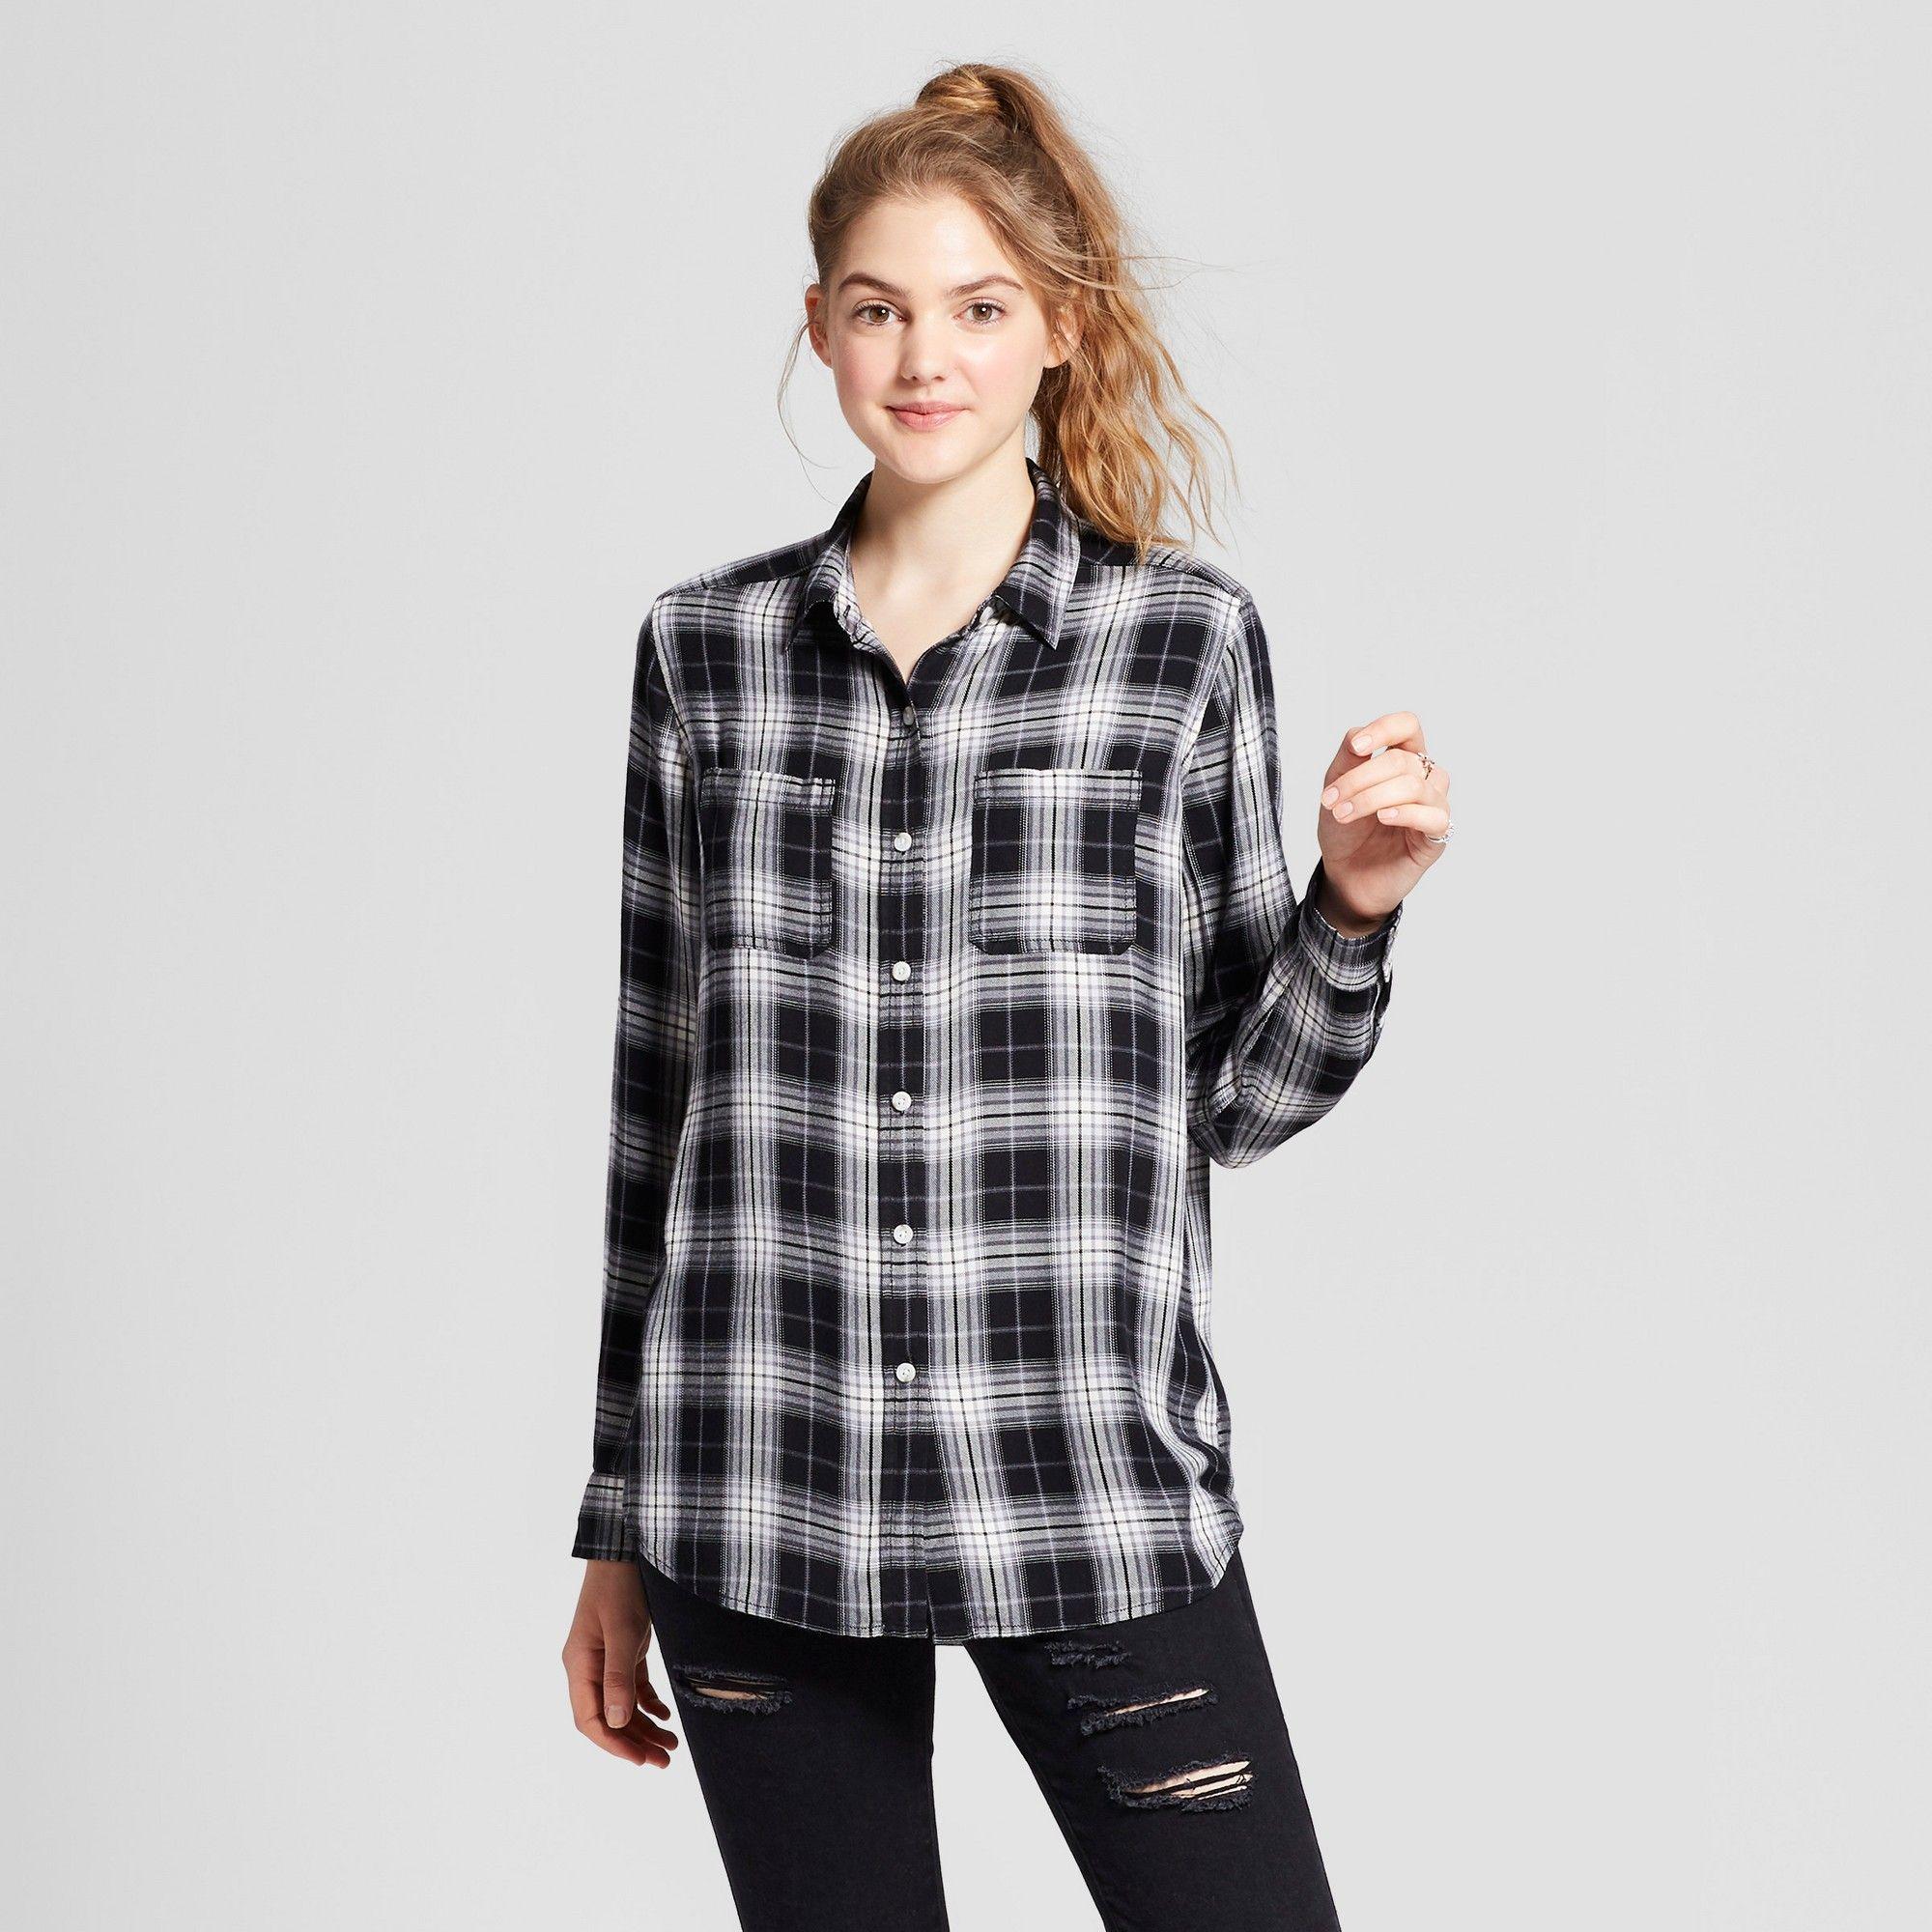 Women s Boyfriend Button Down Shirt - Mossimo Supply Co. Black Xxl ... 336a6d32fd